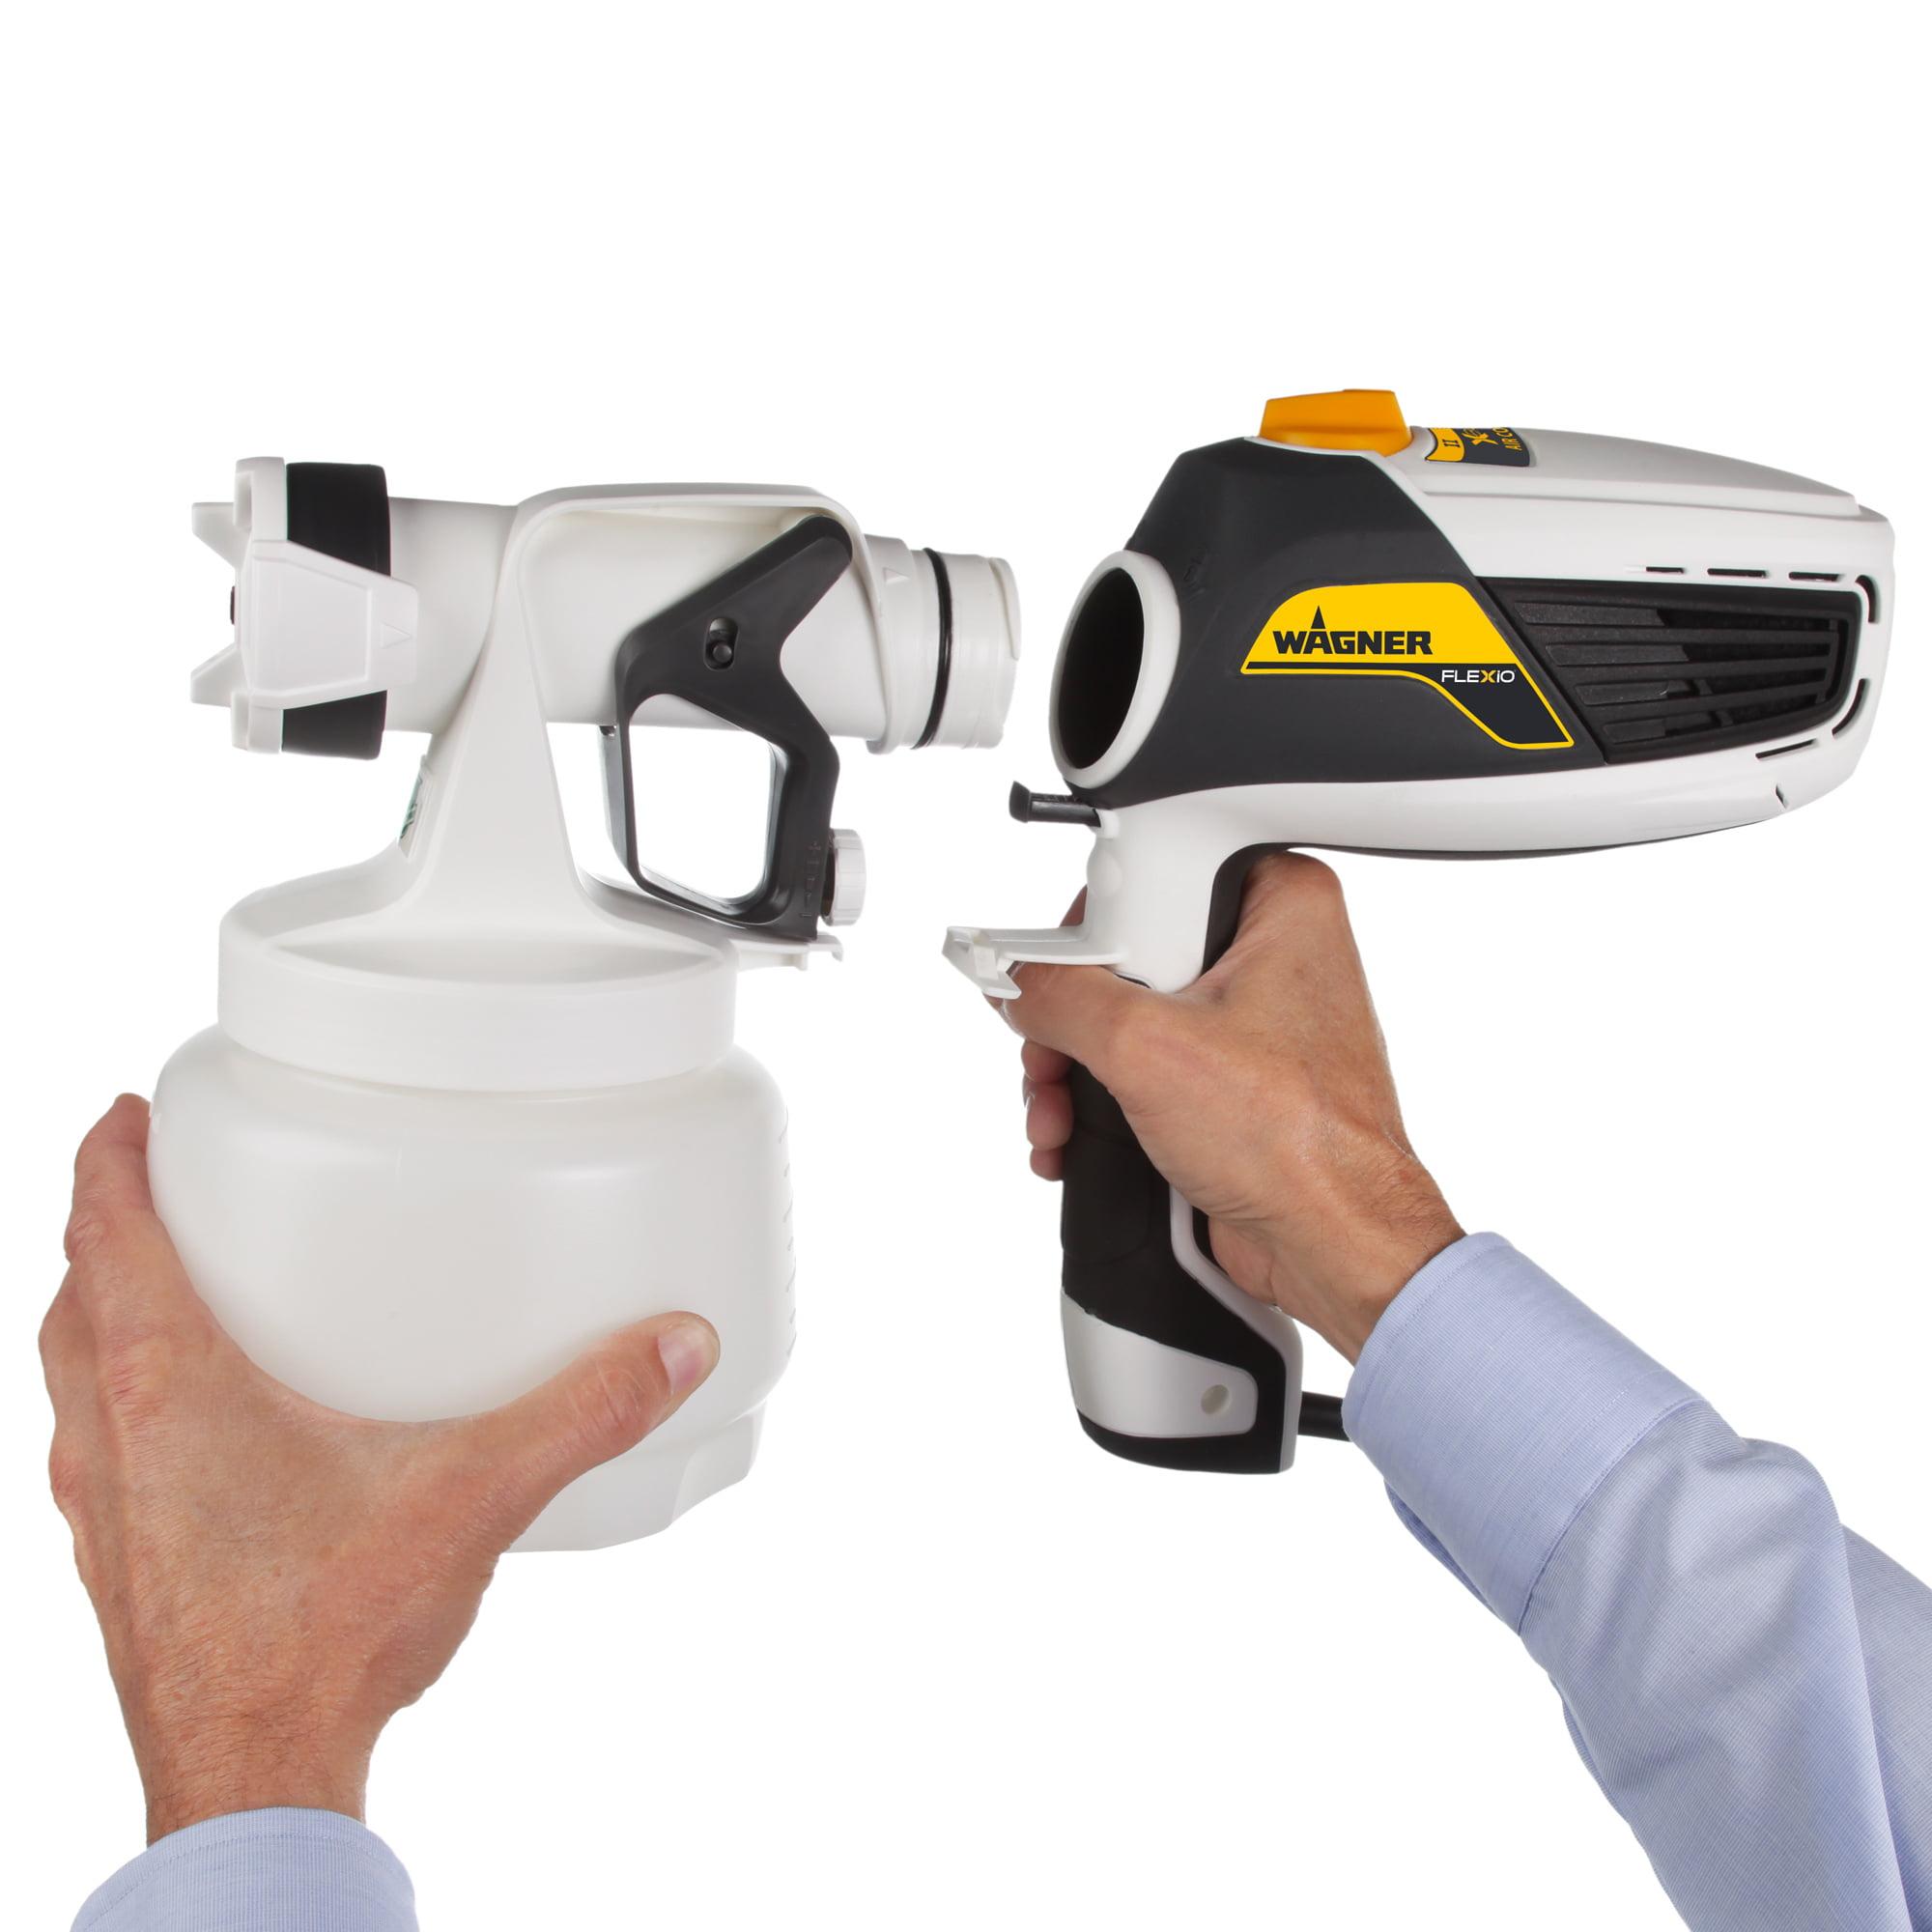 wagner flexio 575 sprayer with accessory kit - walmart